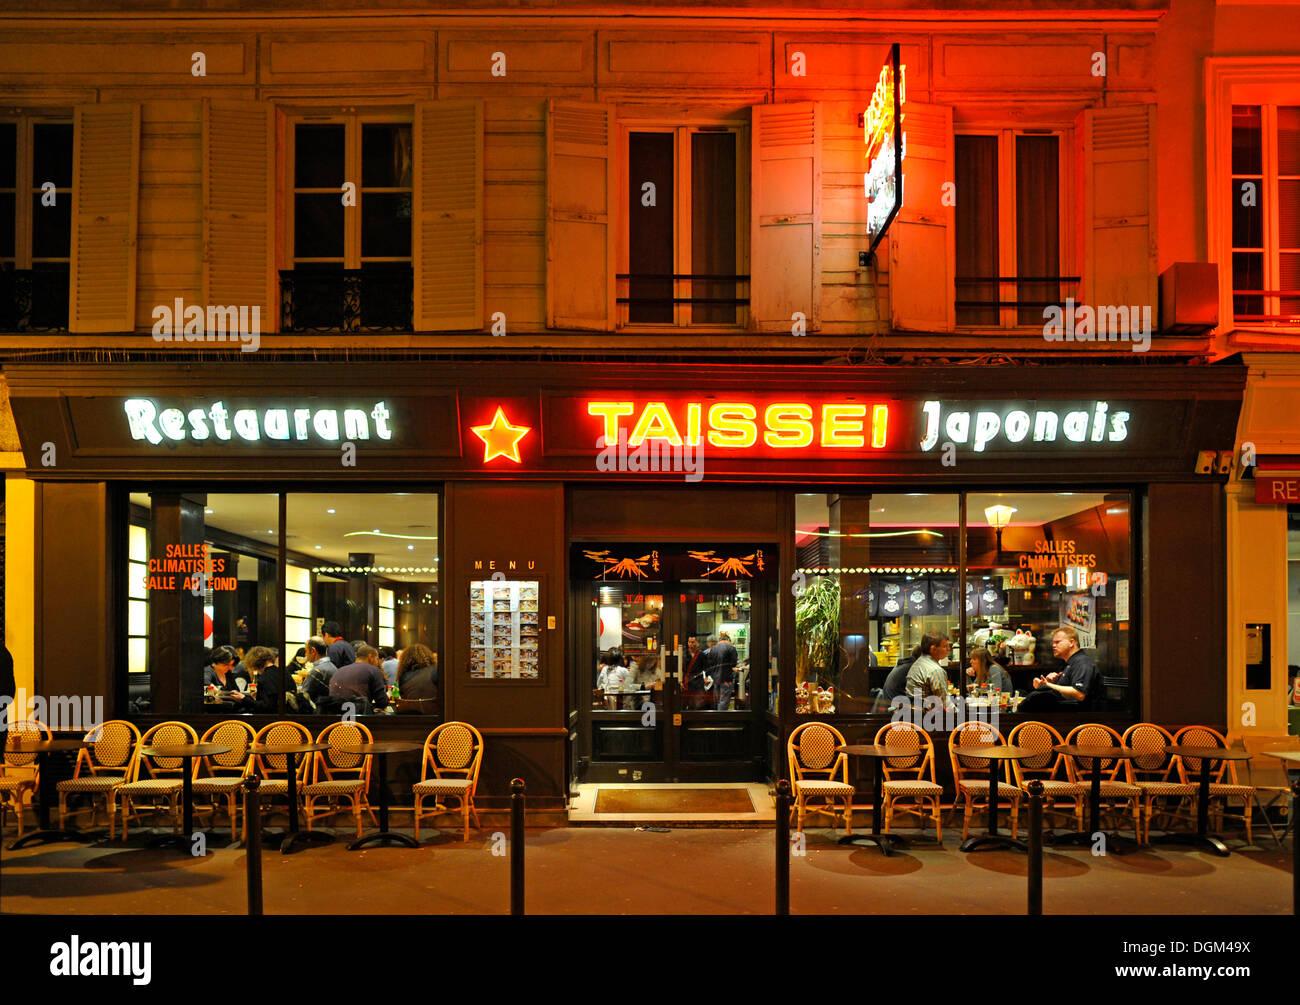 paris france japanese restaurant night stock photos paris france